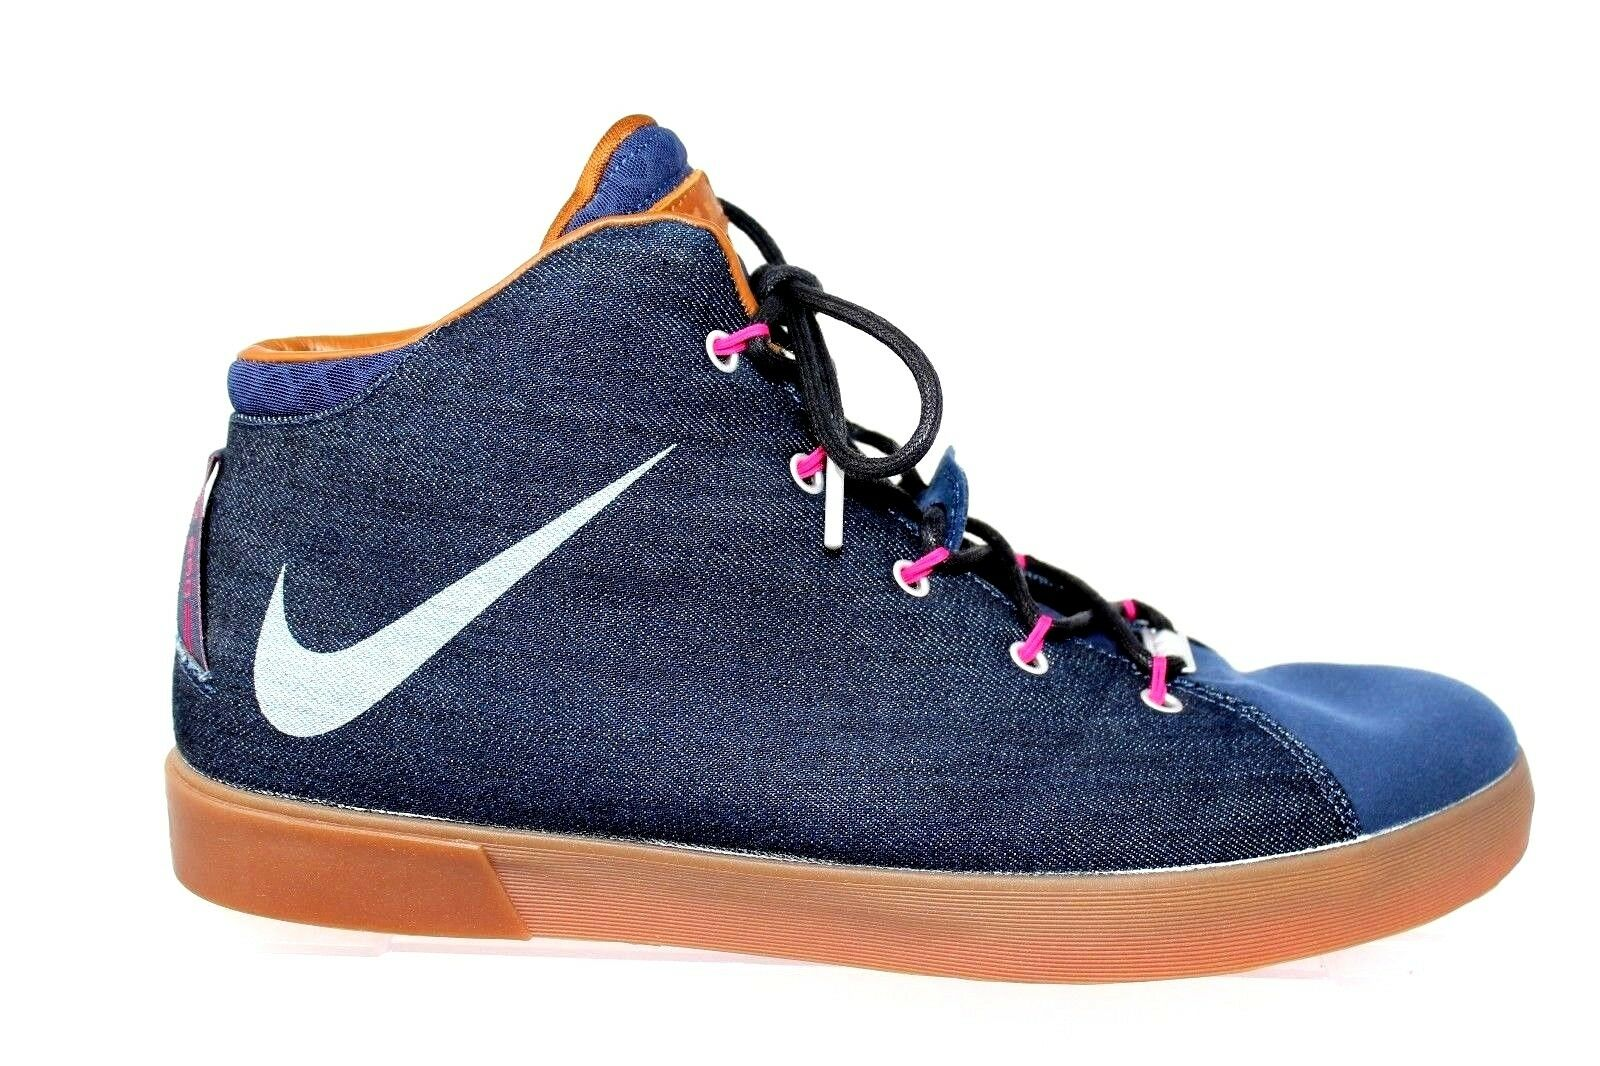 Nike Lebron XII XII XII NSW Lifestyle QS Denim Sneaker 716424-400 Mens Size 15 dd8a53